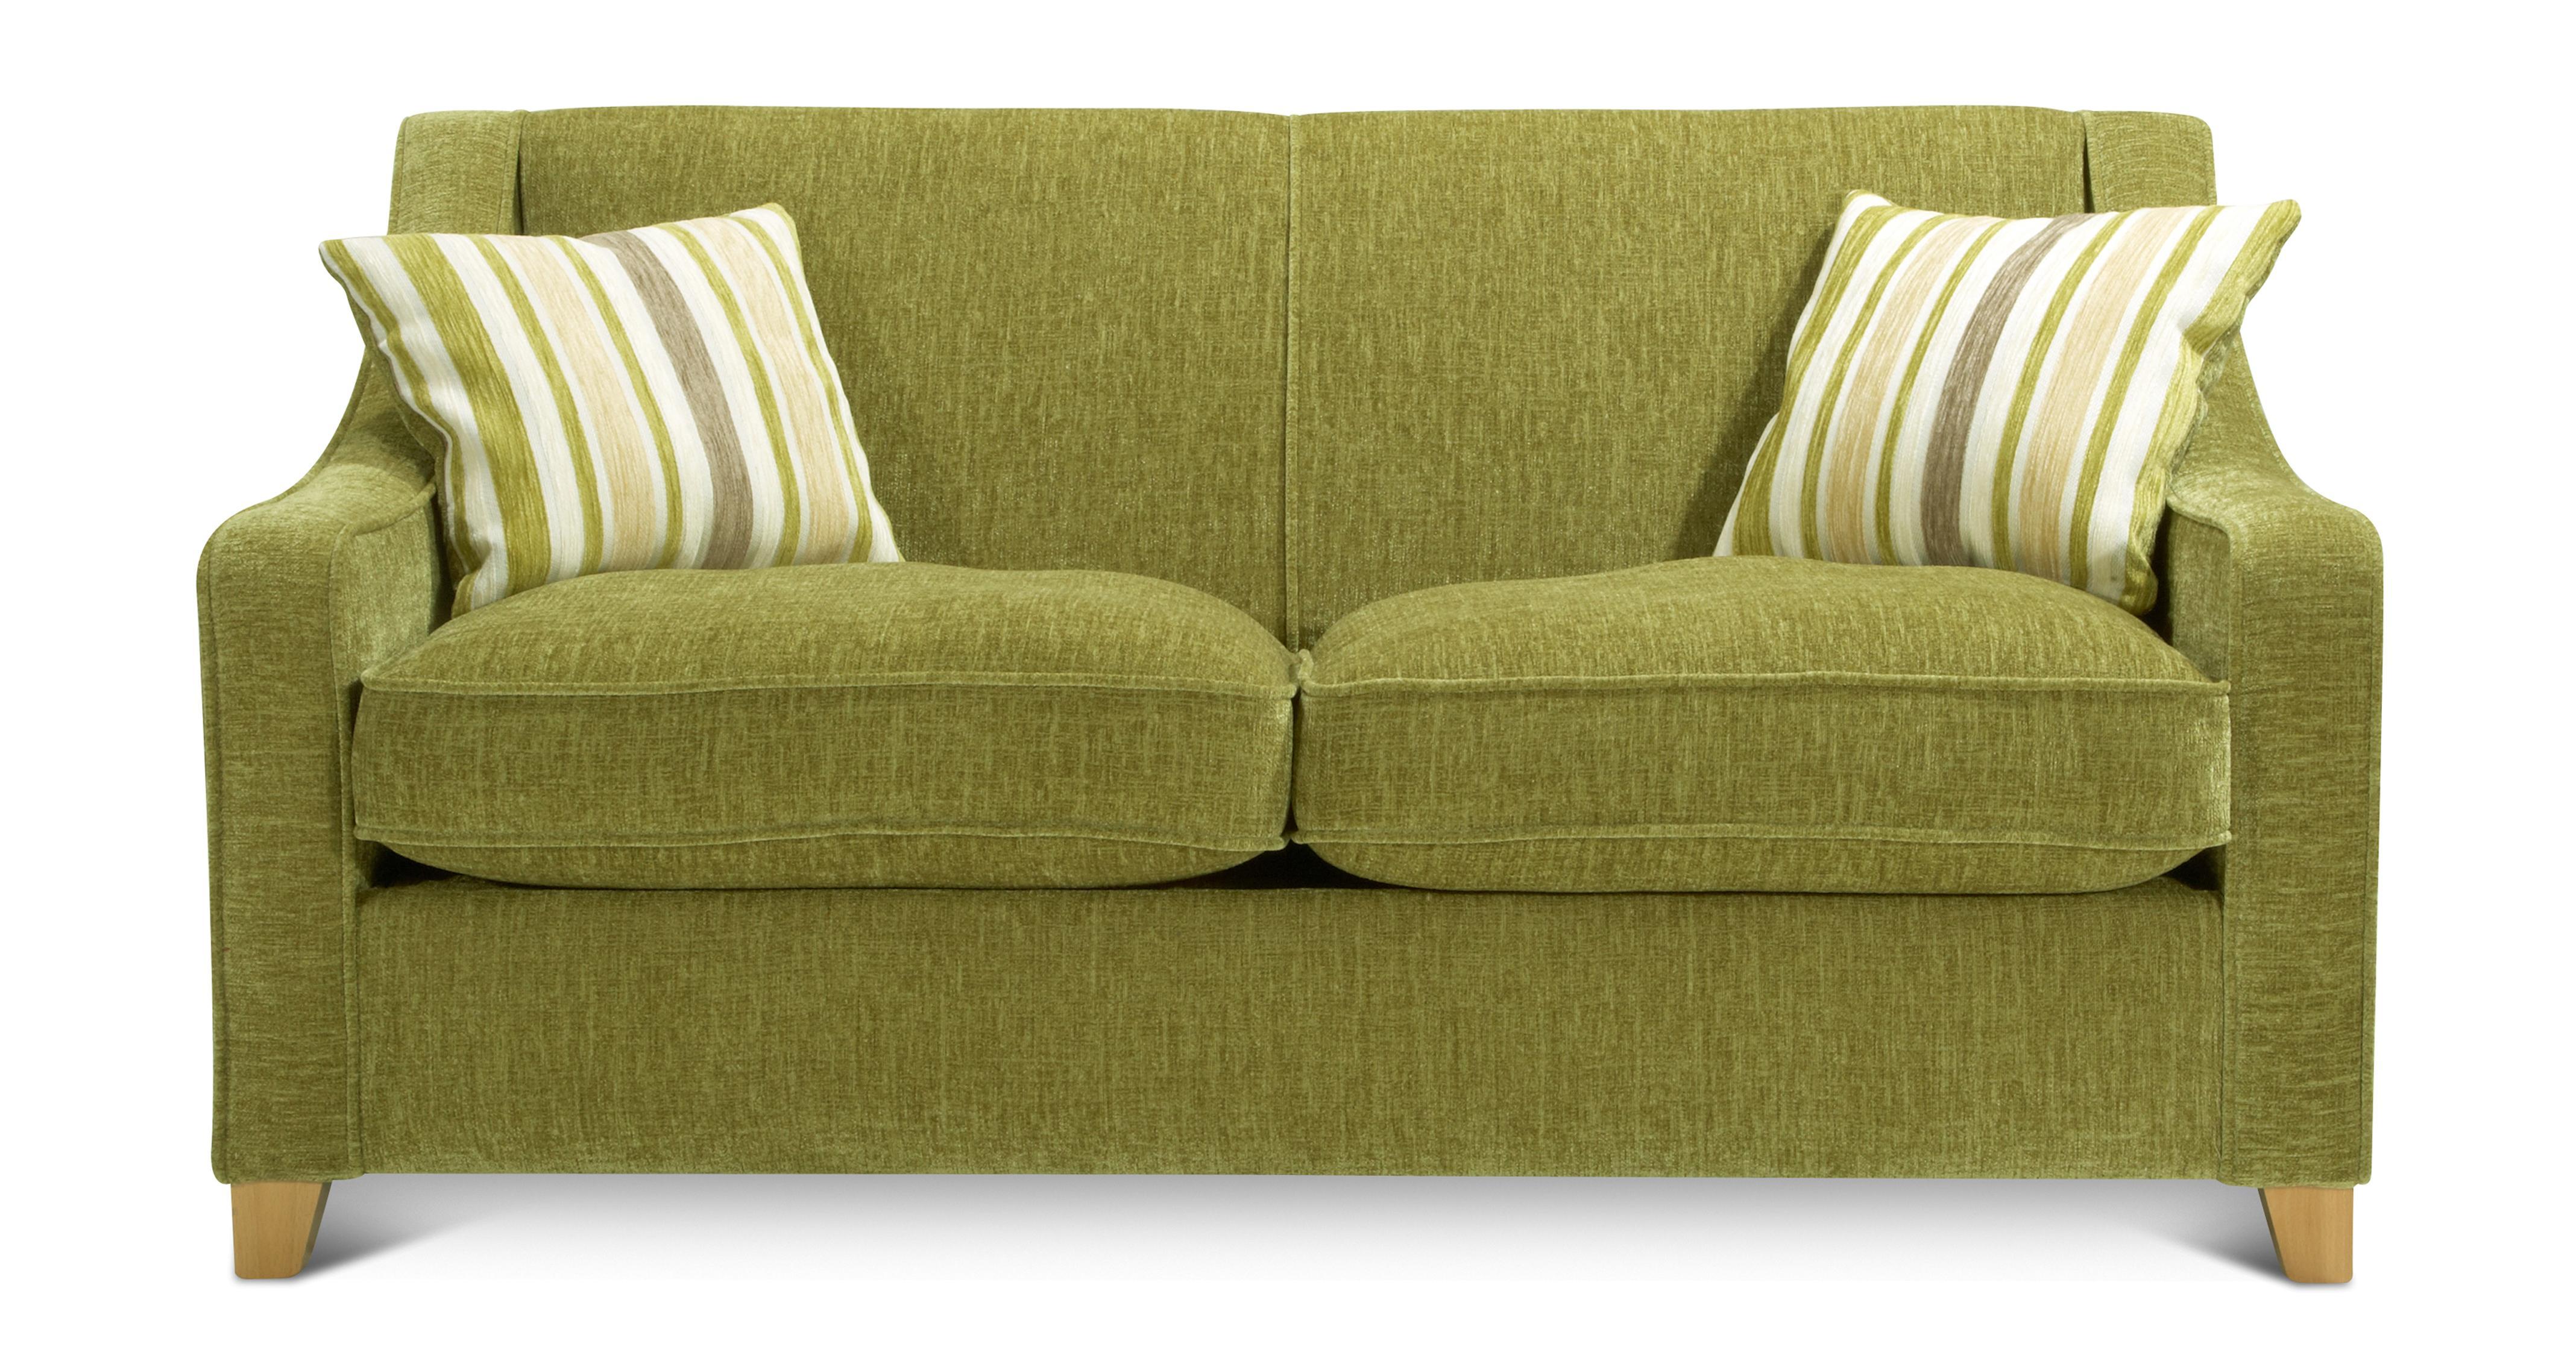 rachel 2 seater compact sofa bed dfs. Black Bedroom Furniture Sets. Home Design Ideas